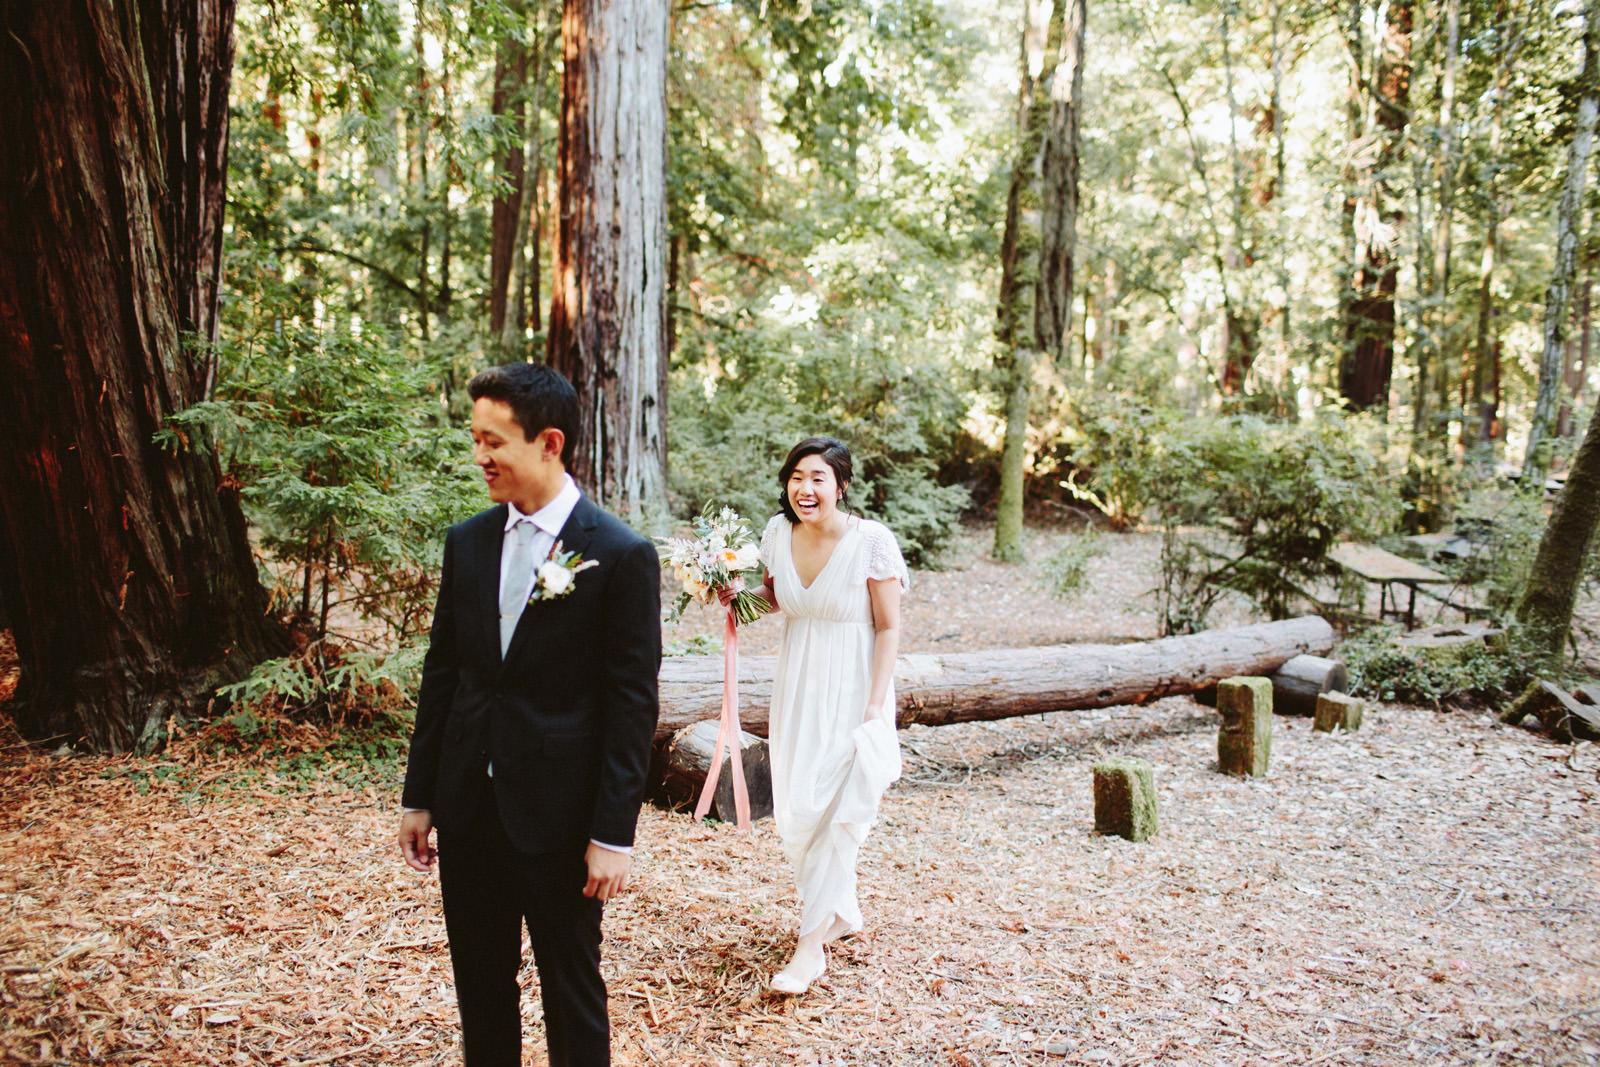 kimclay-blog-004 REDWOOD FOREST WEDDING